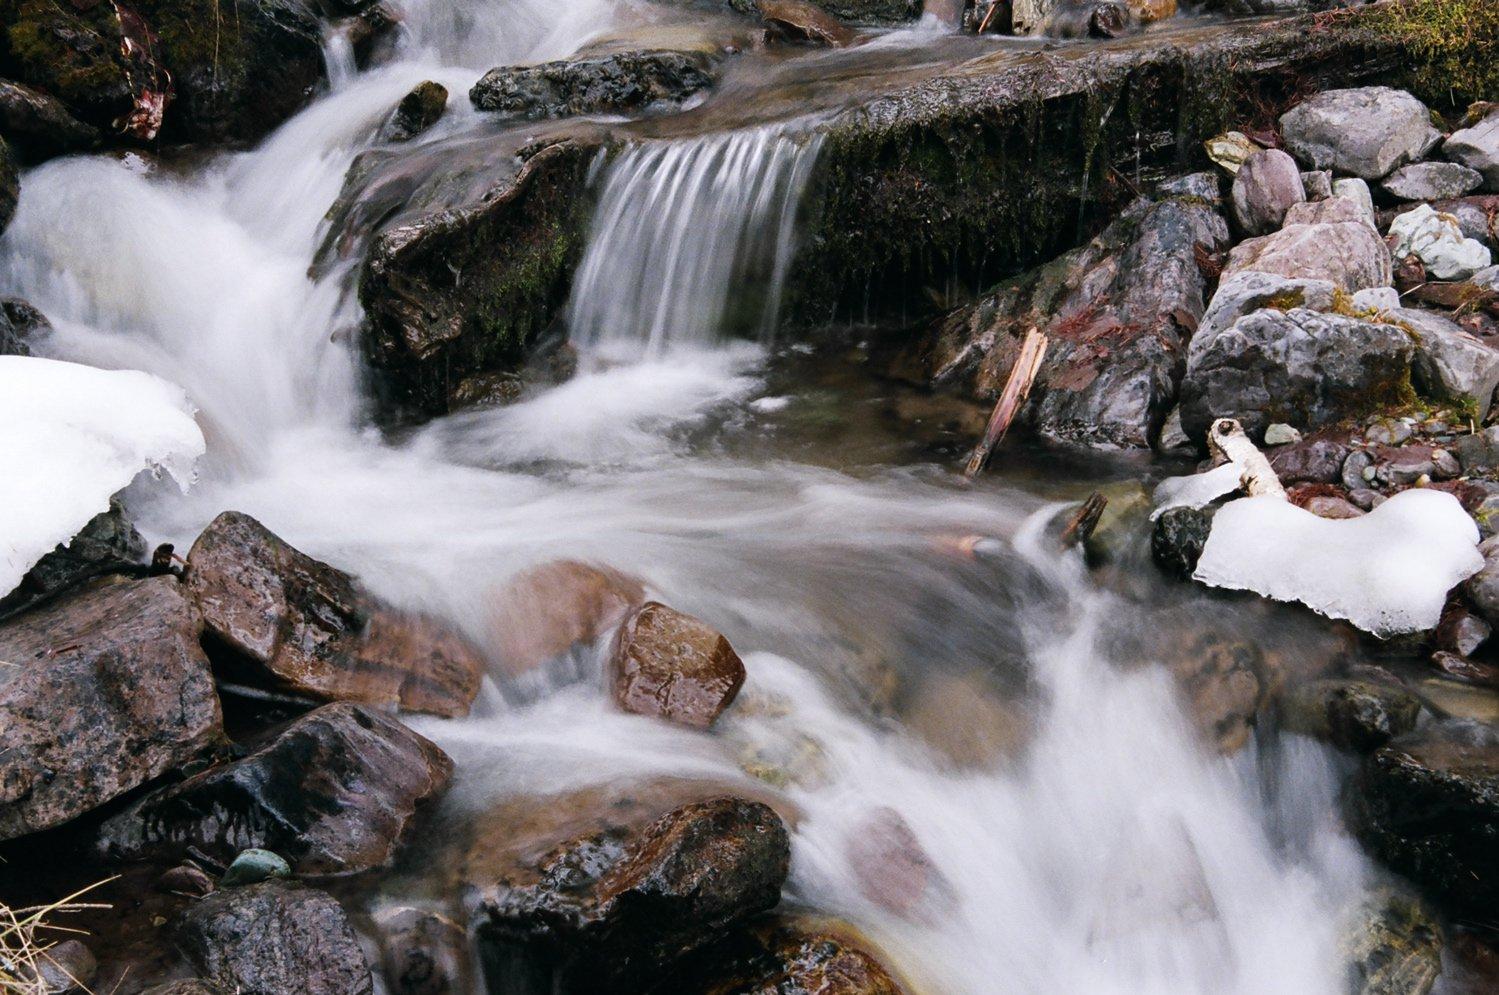 Creek Exposure